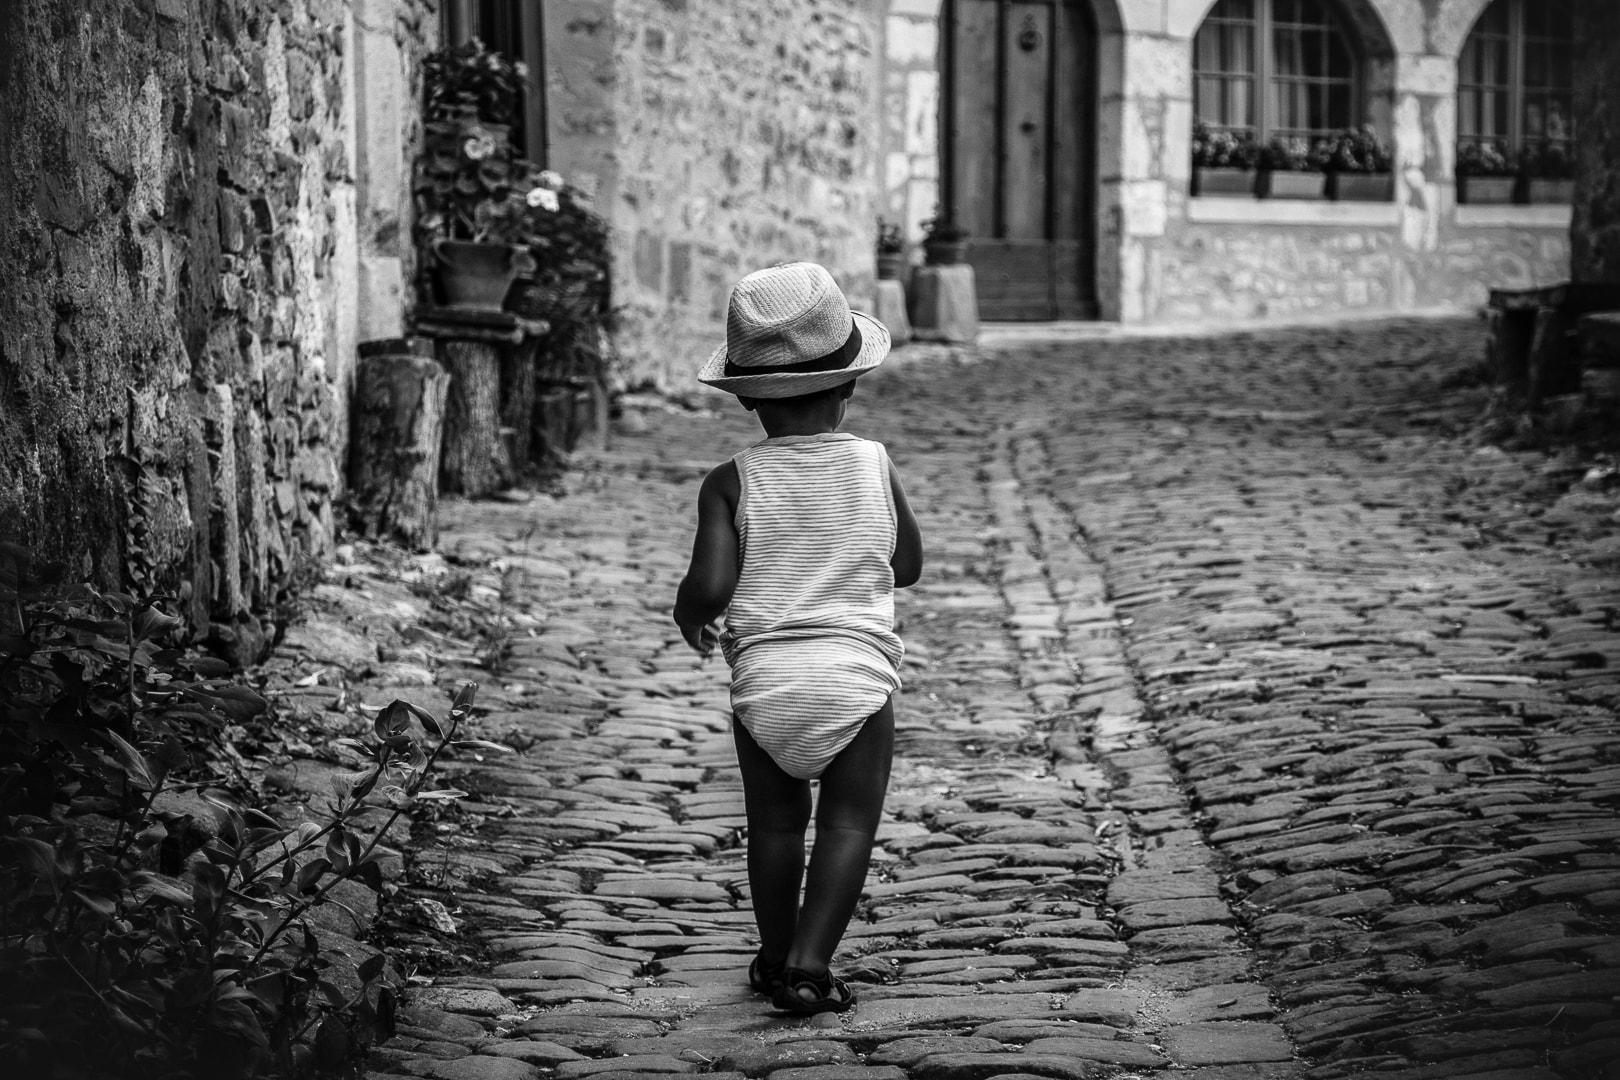 trezors-photography-photographe-professionnel-toulouse-31-enfance-seance-famille-lifestyle (3)